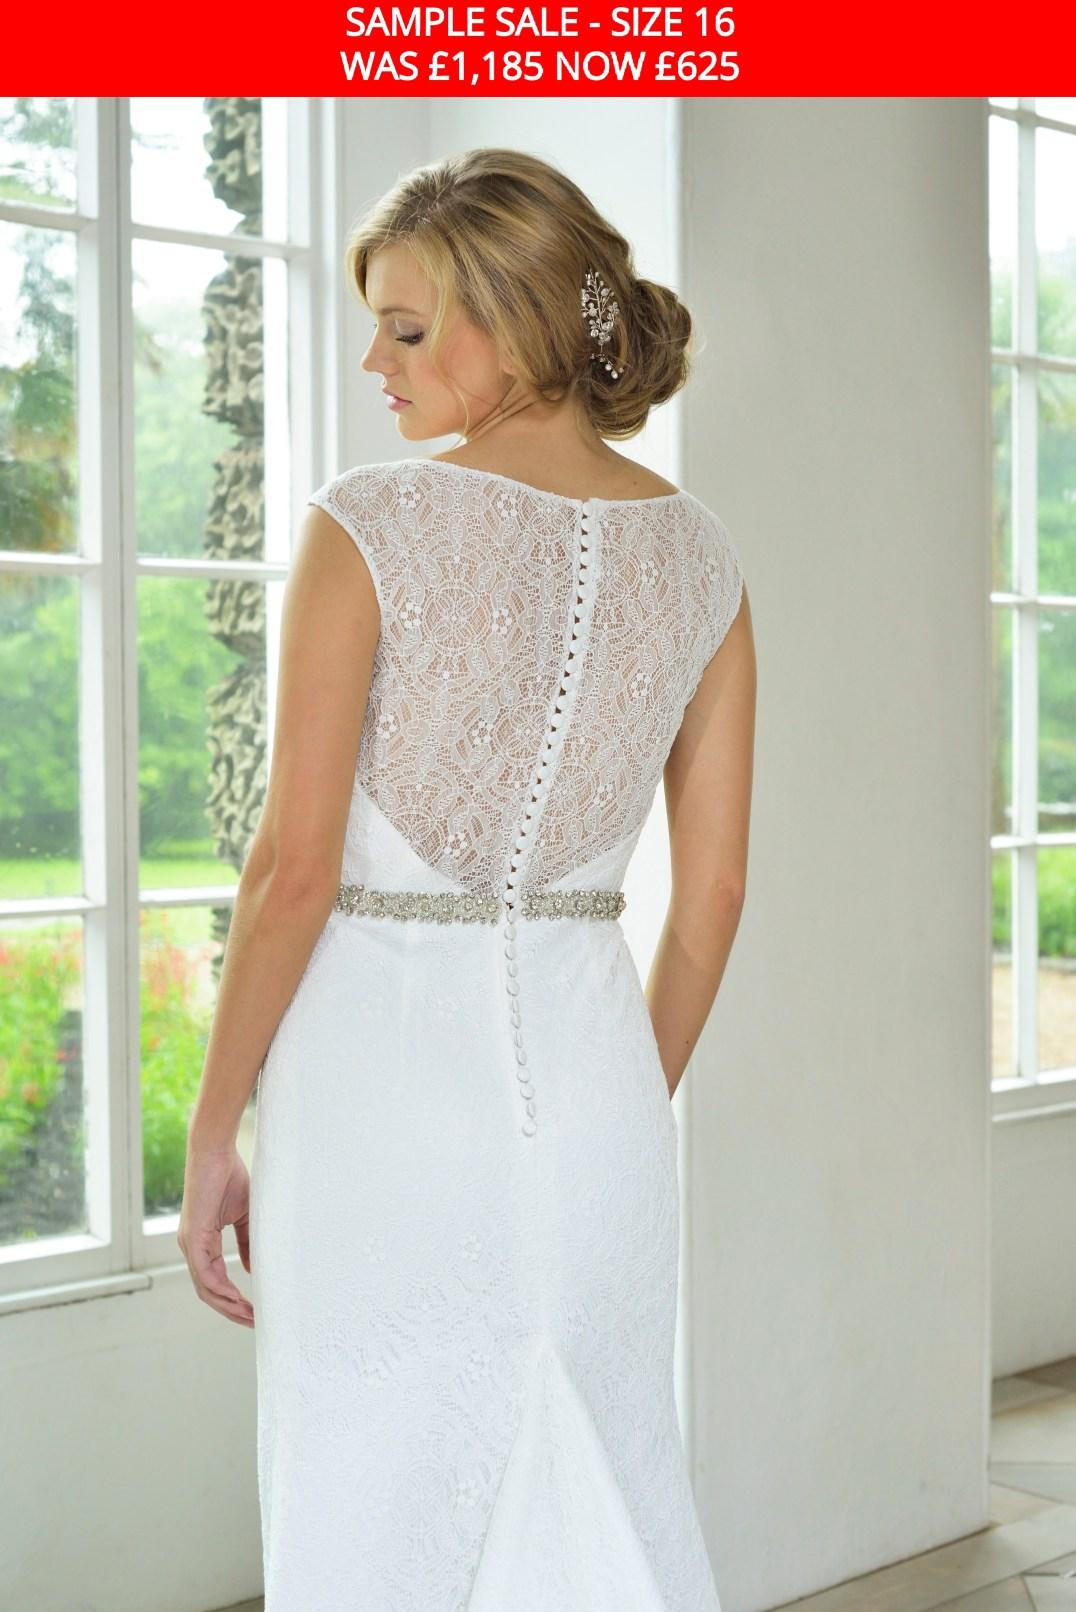 GAIA 1712 wedding dress back sample sale